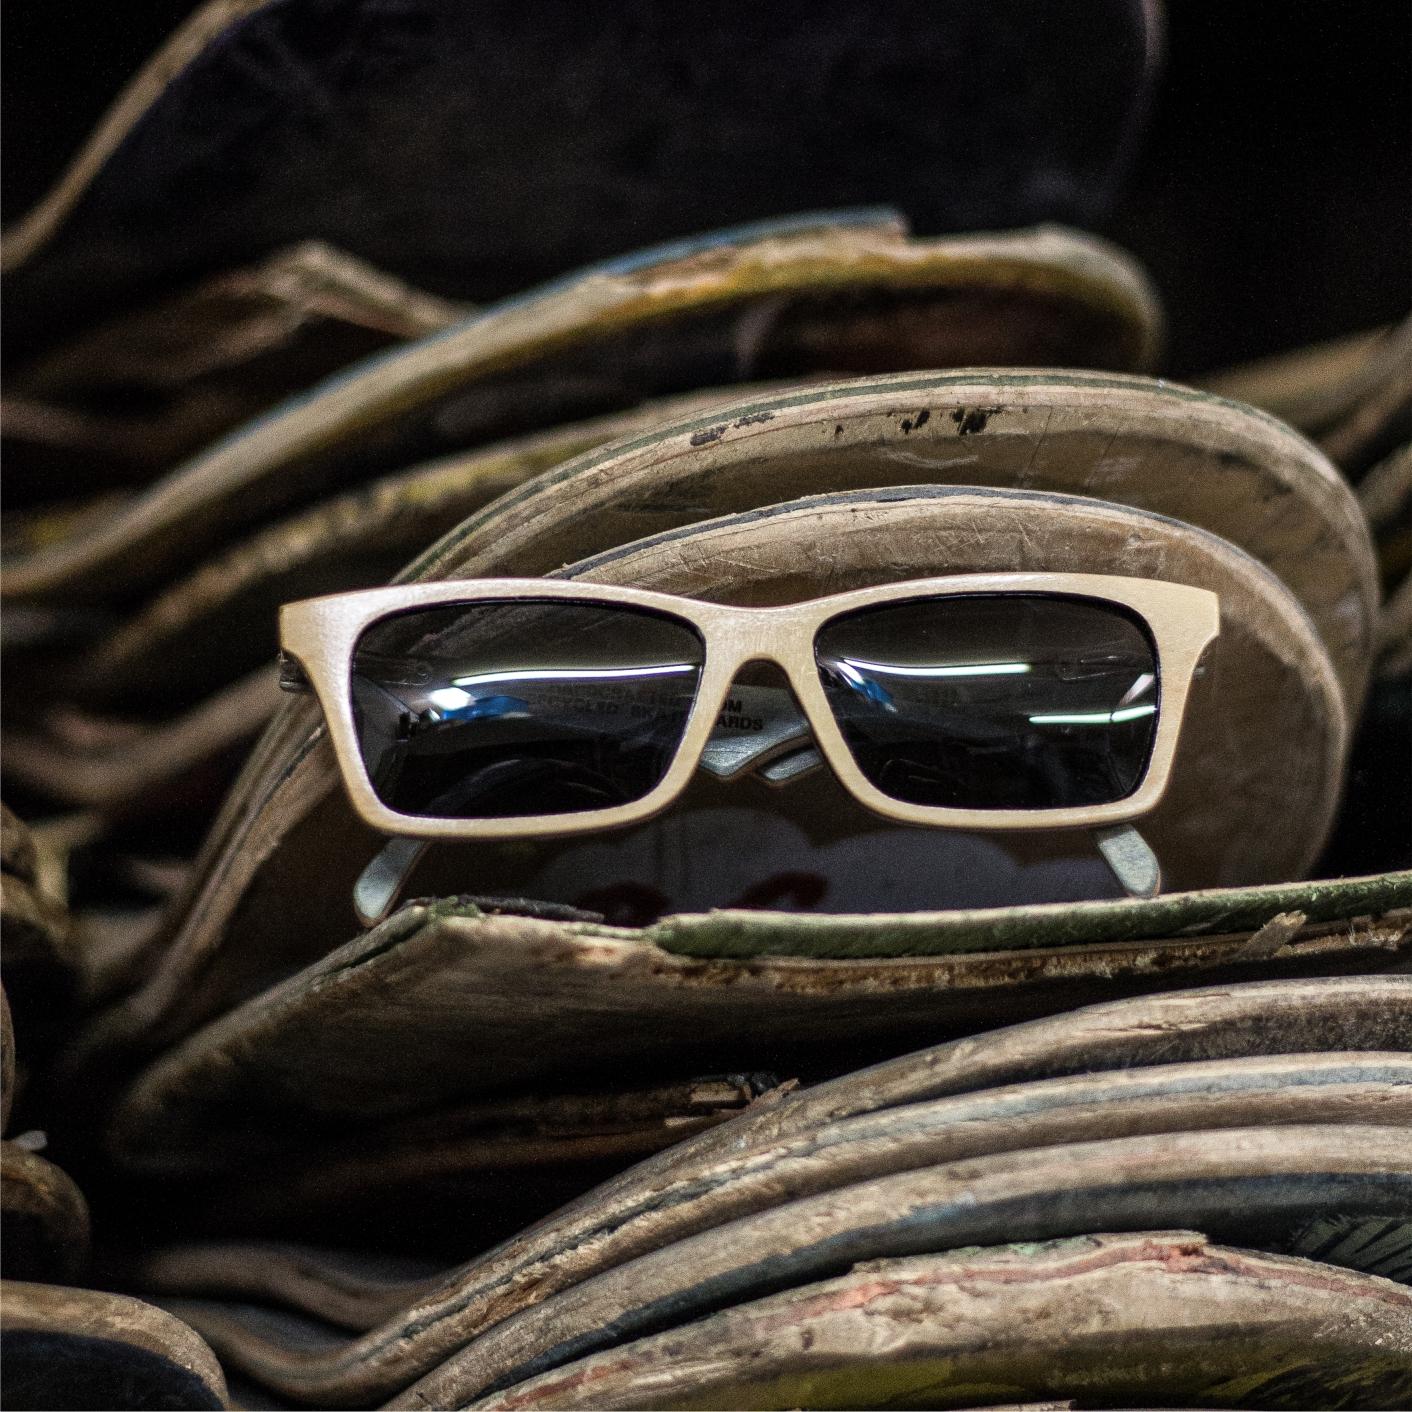 Woodrow SK8Glasses